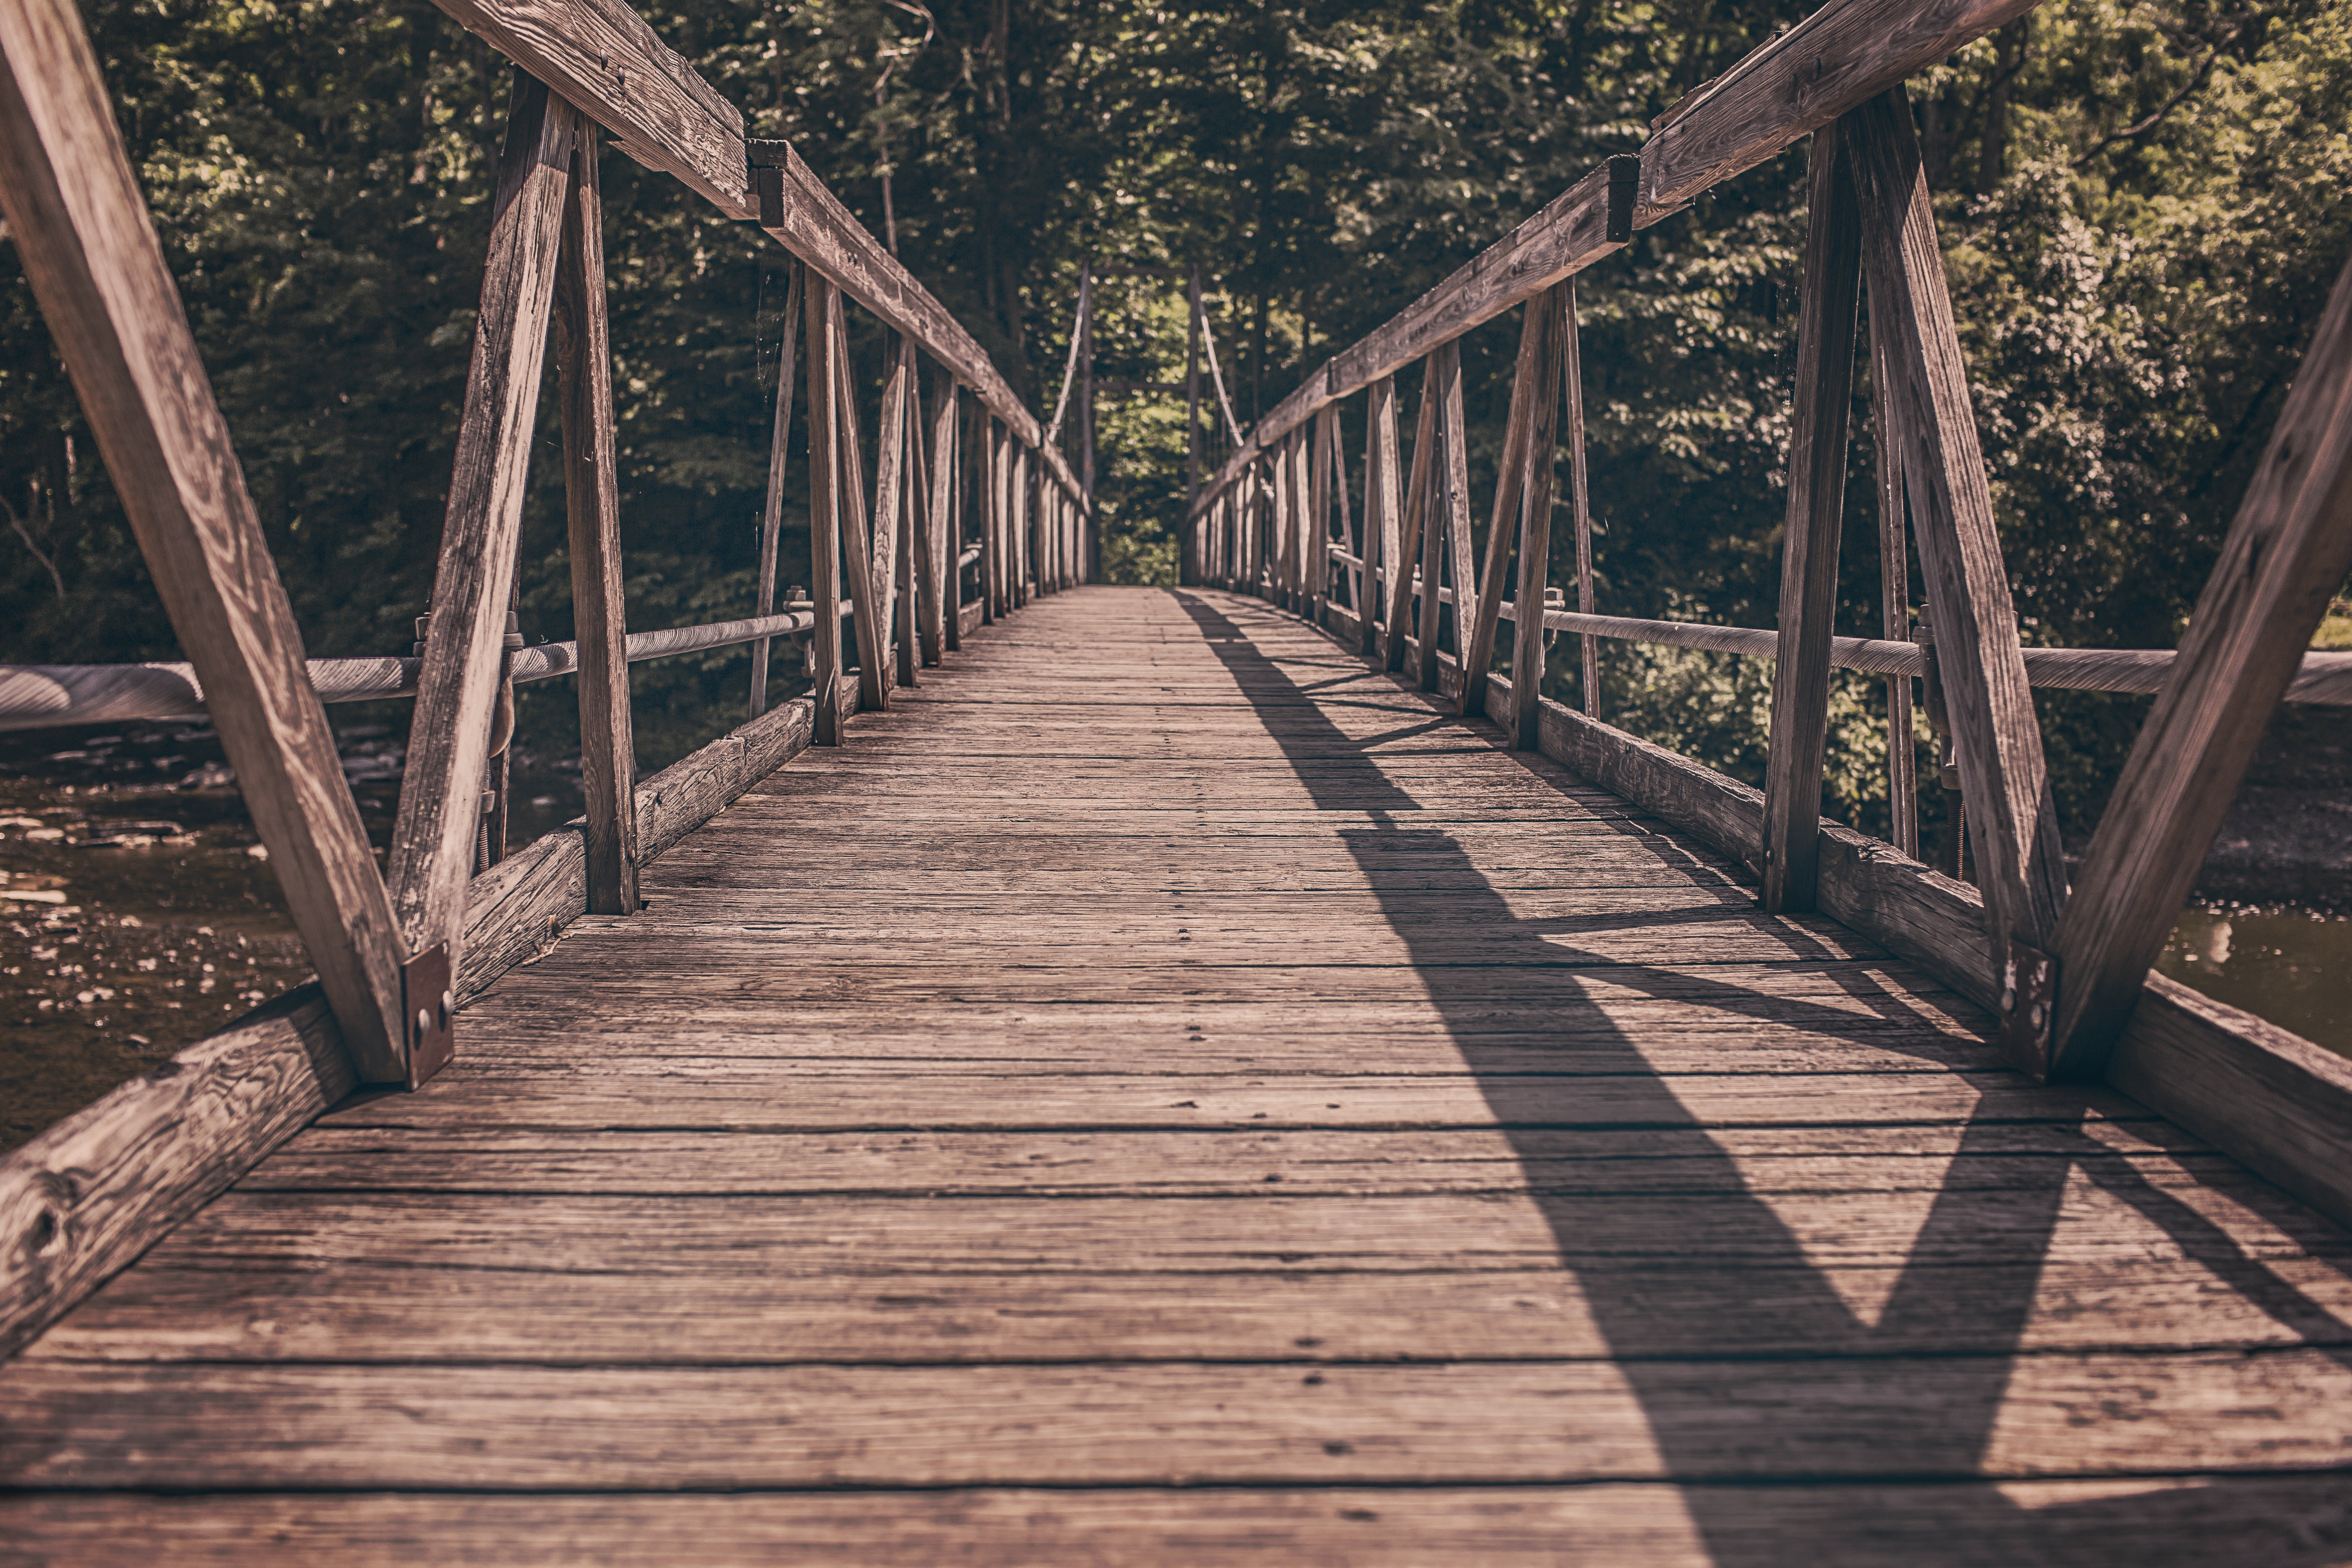 image of a wooden bridge